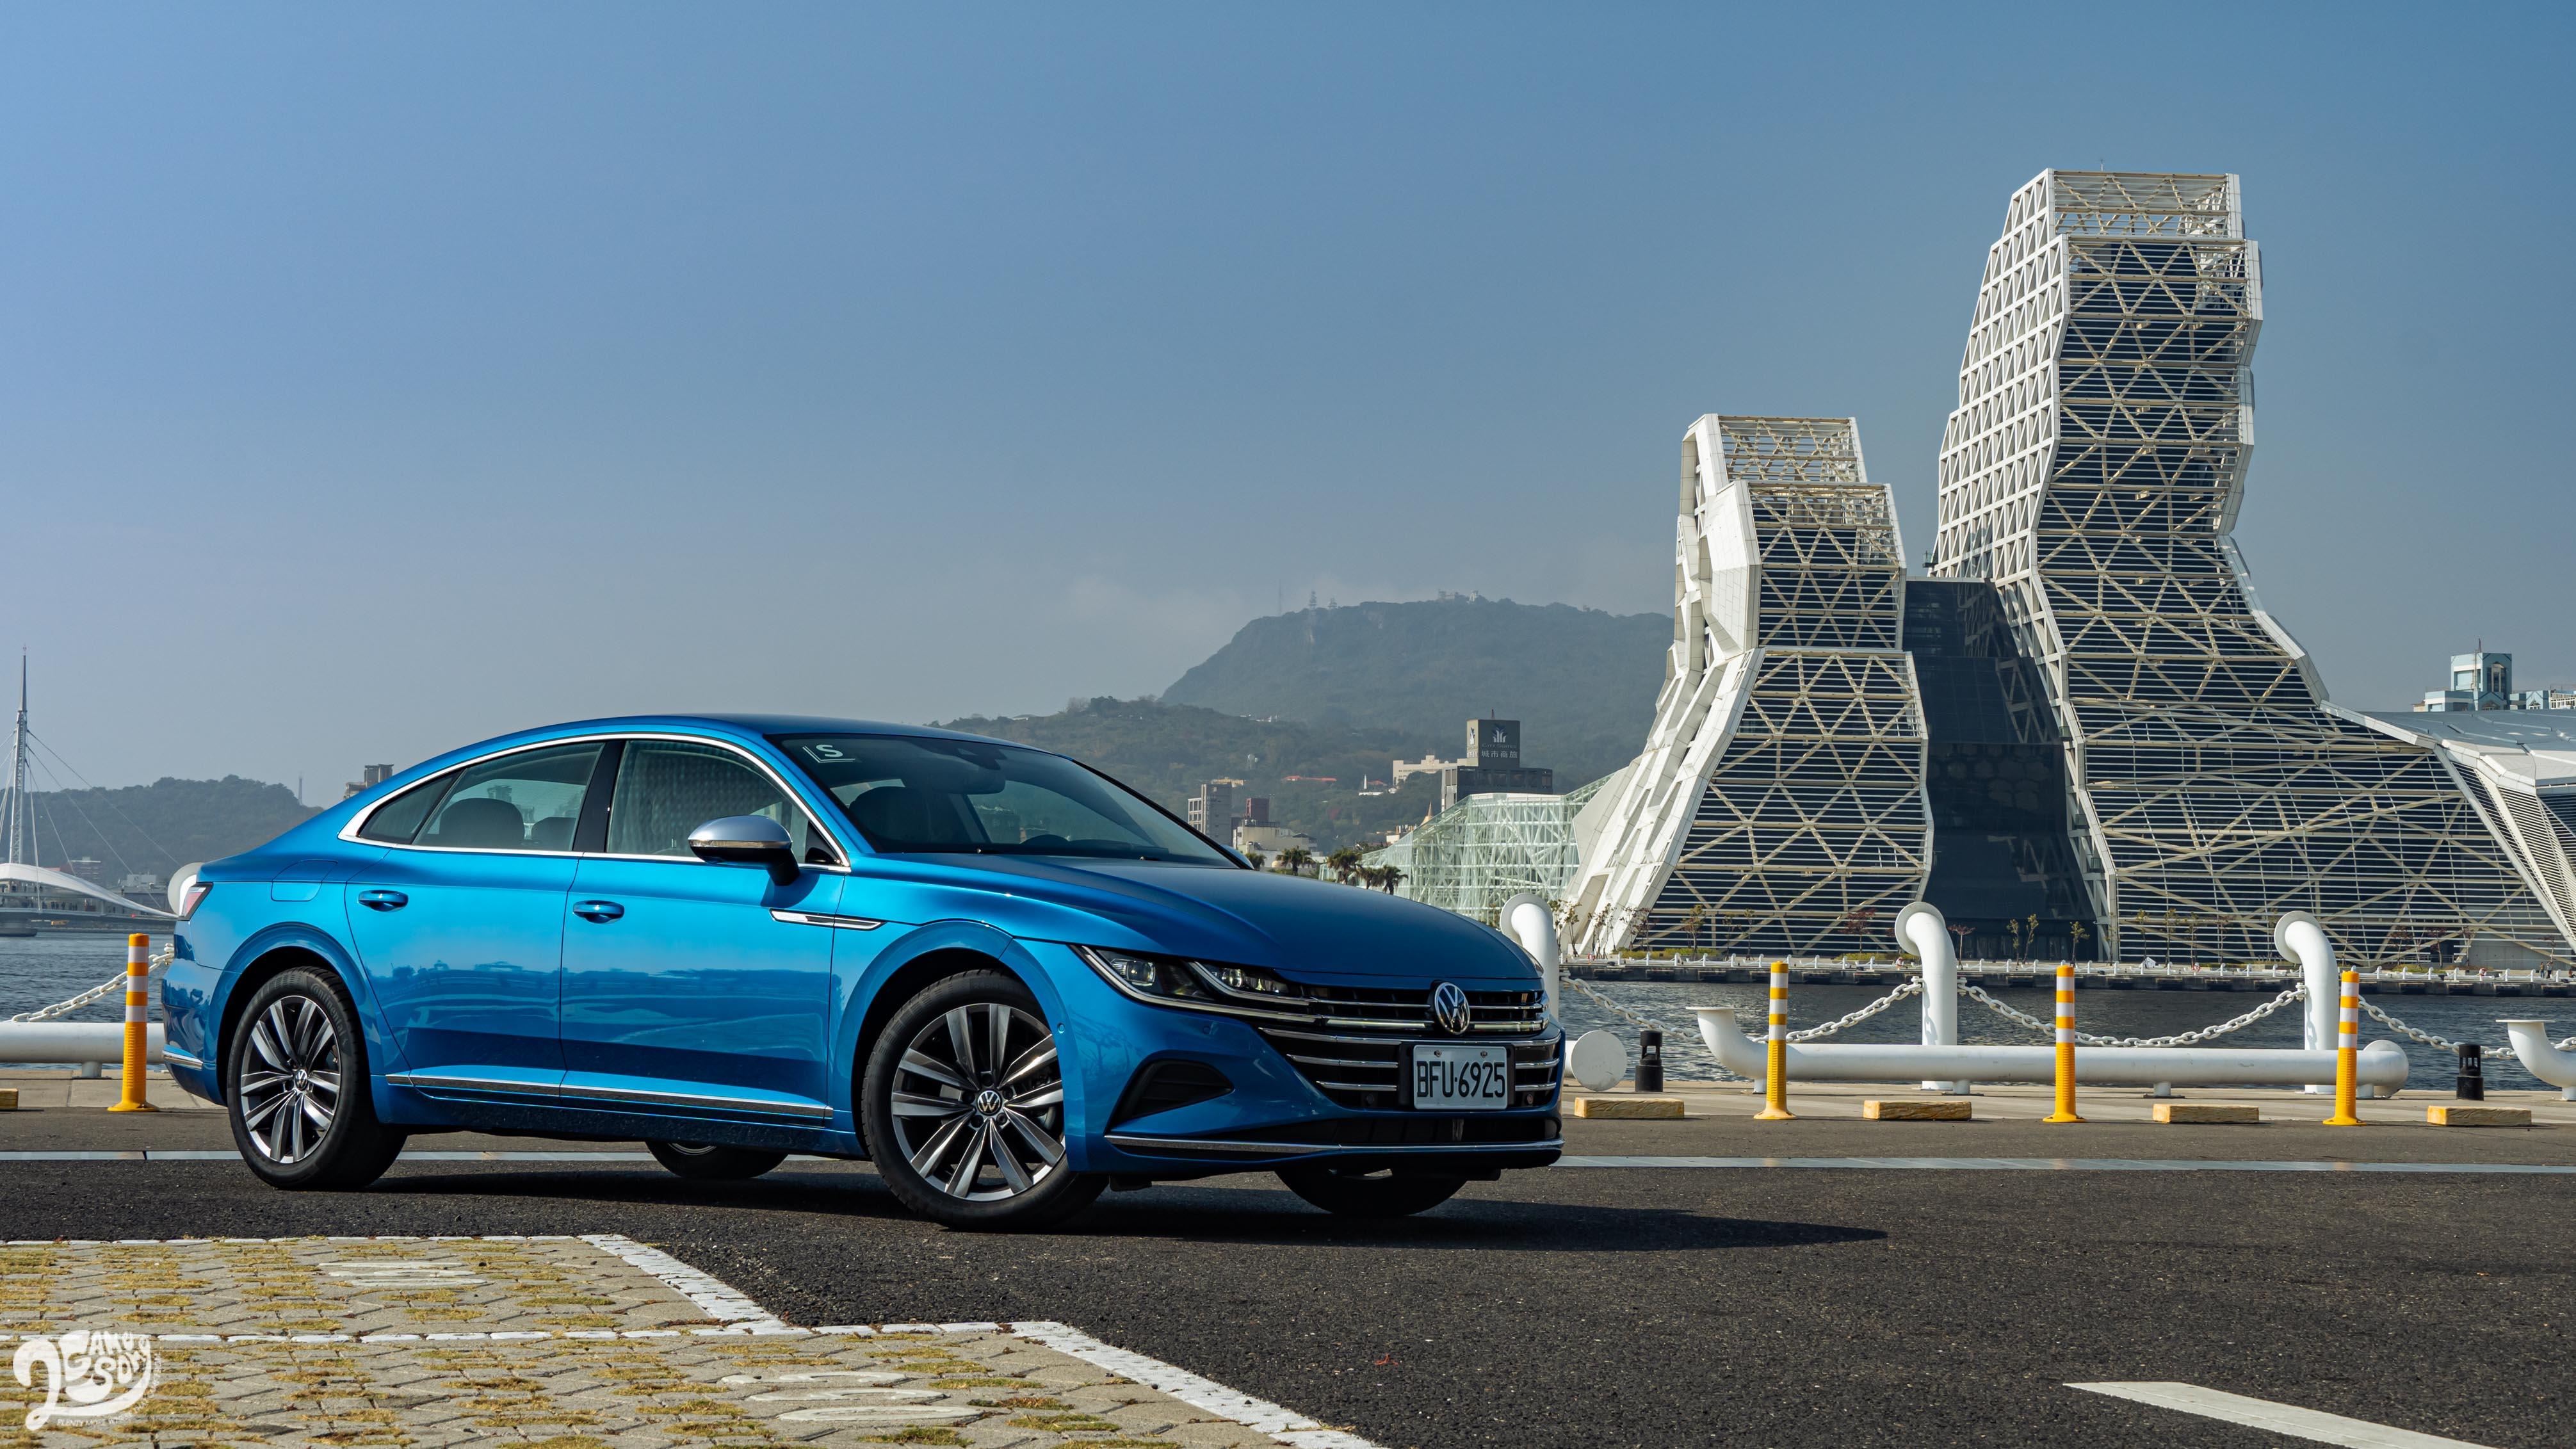 試駕車款為 Arteon Fastback 330 TSI Elegance Premium,售價新台幣 165.8 萬元起。